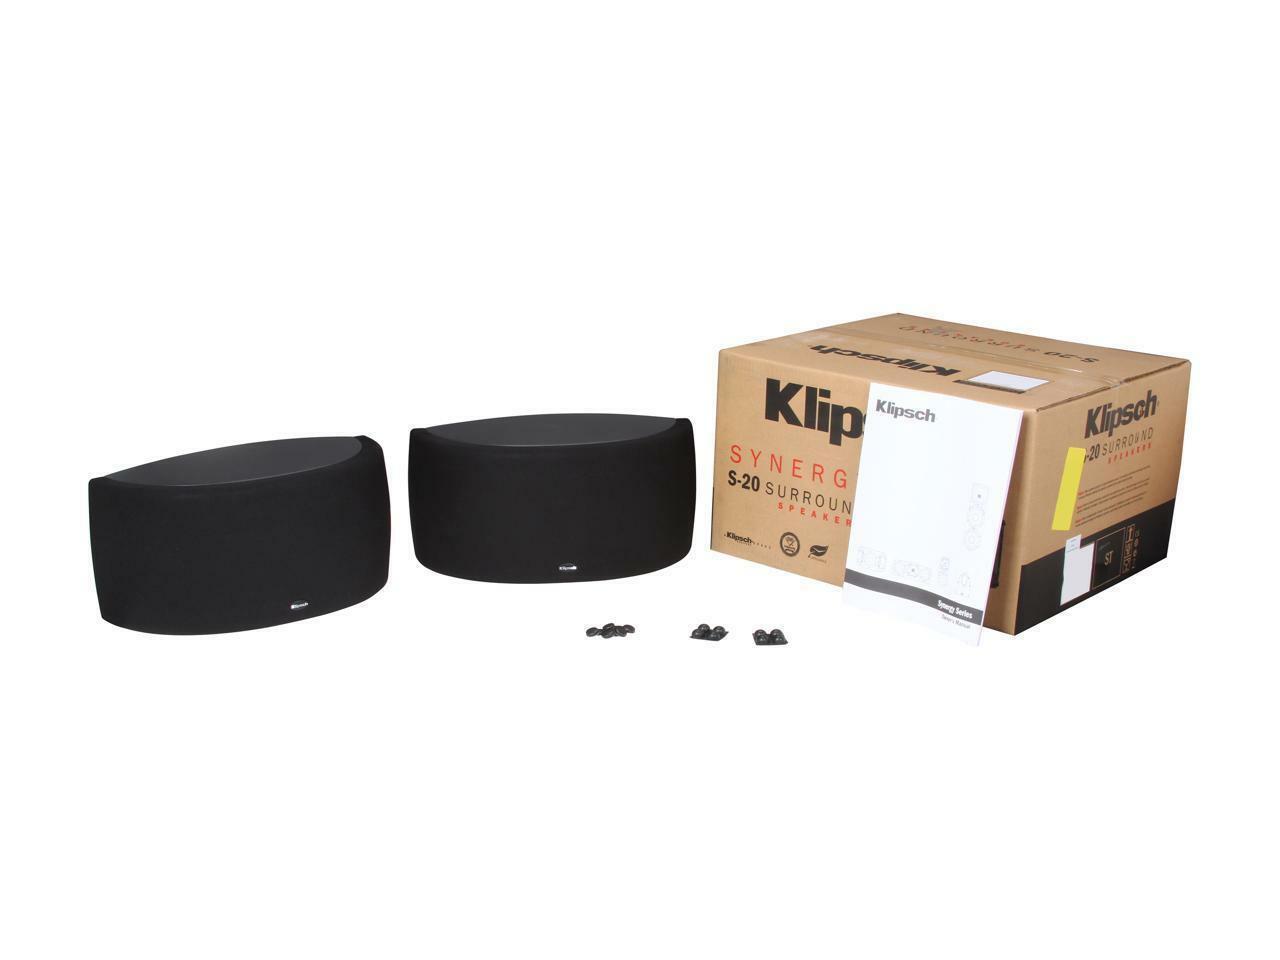 [PAIR] Klipsch Synergy S-20 Surround Speakers